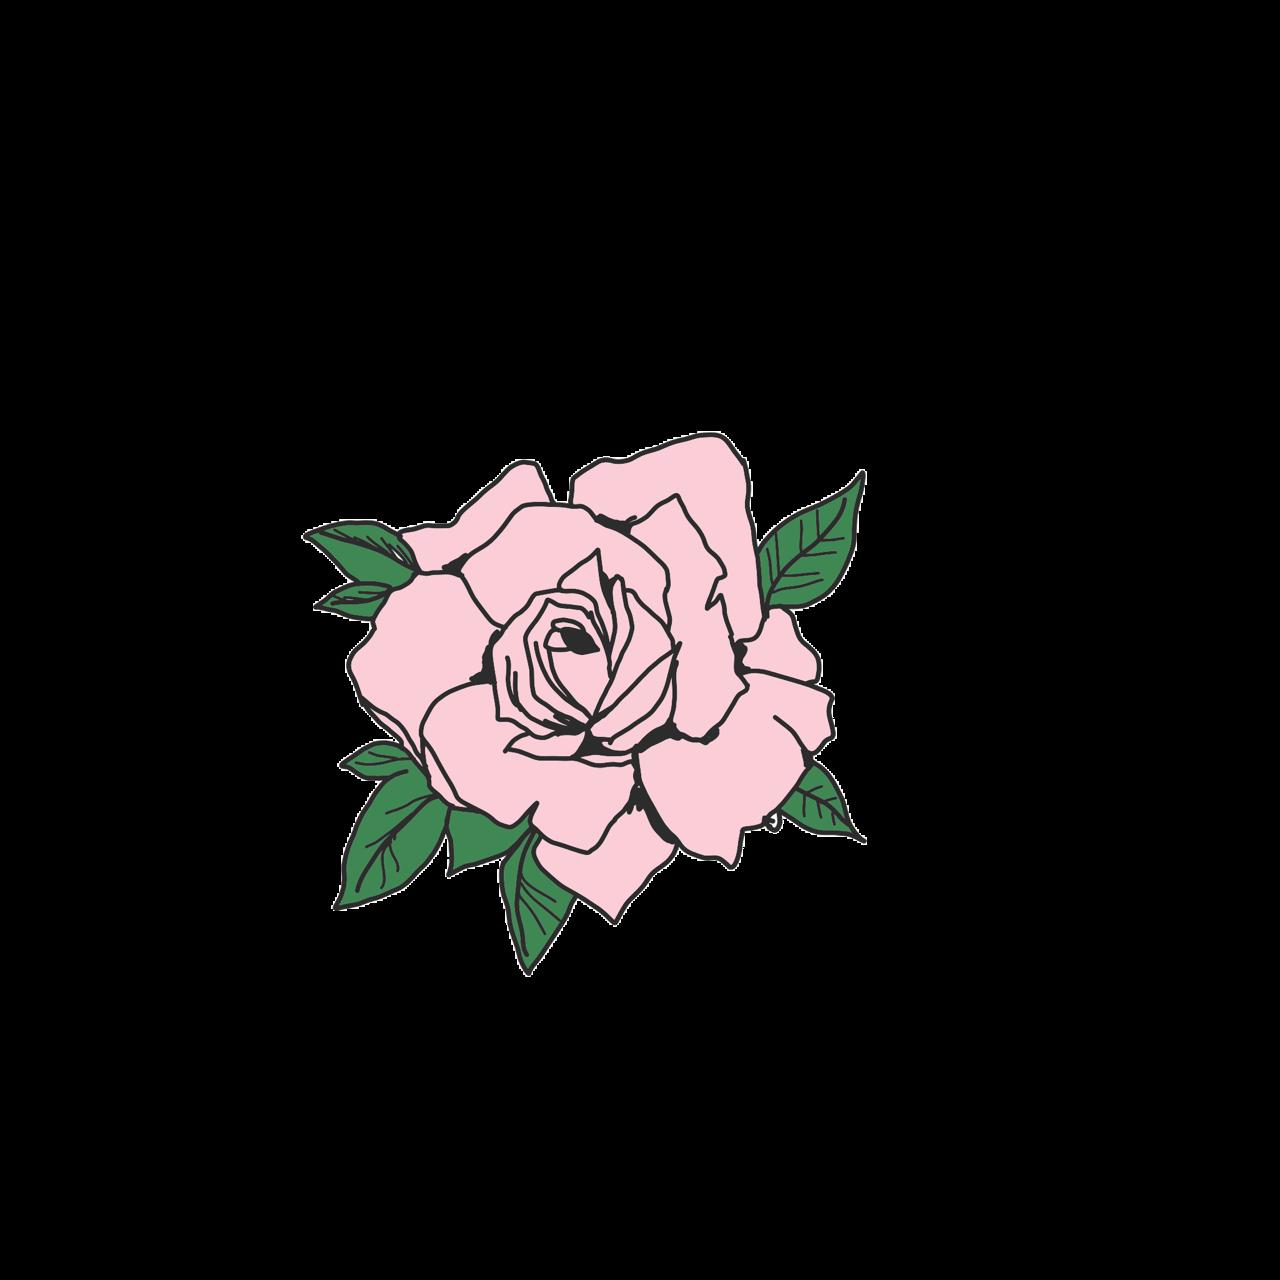 Aesthetic Rose Tattoo Rose Drawing Best Tattoo Ideas